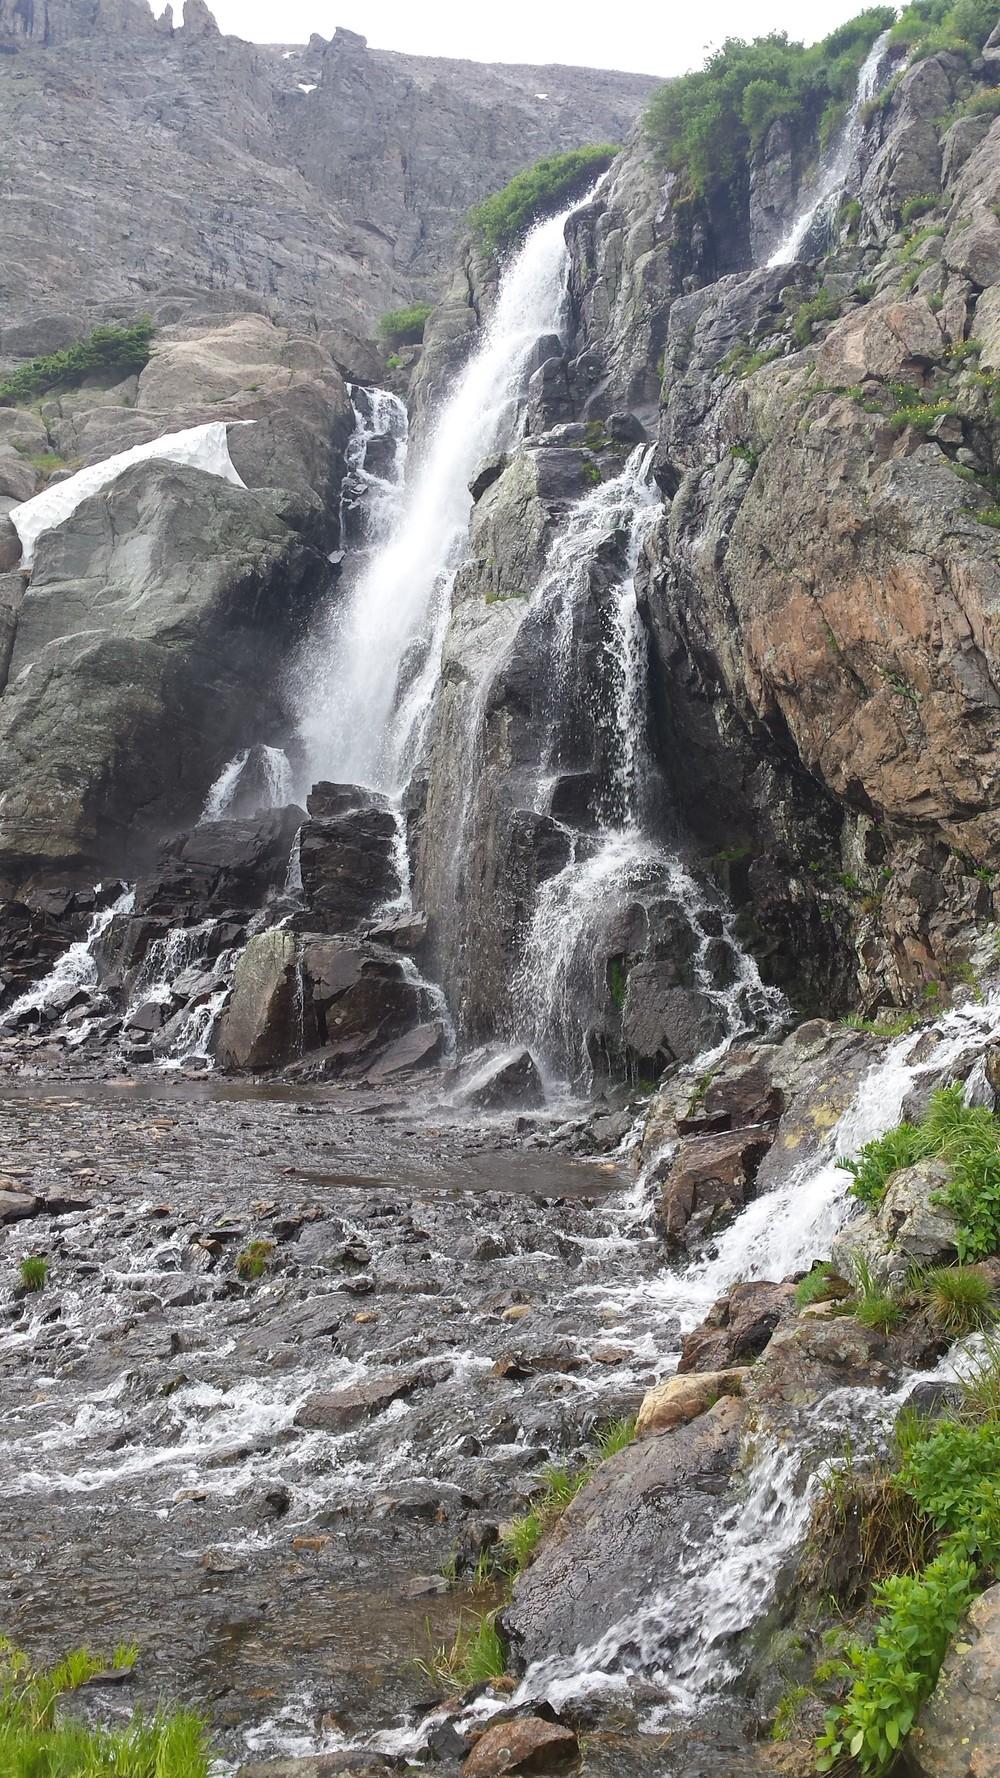 26-timberline-falls-colorado-rekinspire.jpg